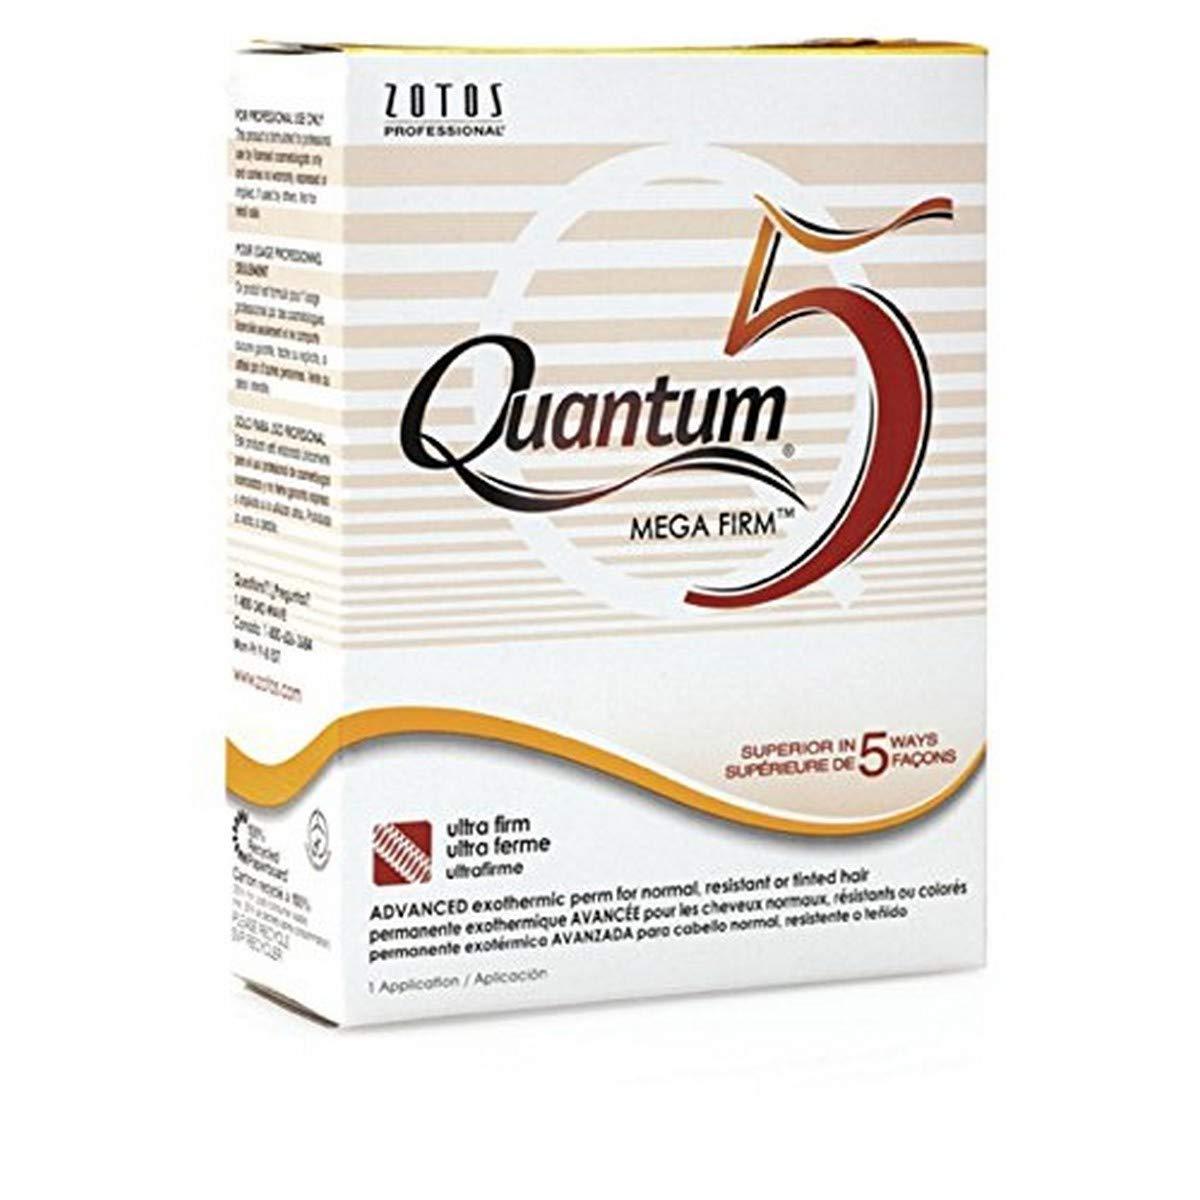 Zotos Quantum 5 Mega Firm Exothermic Perm for One Application